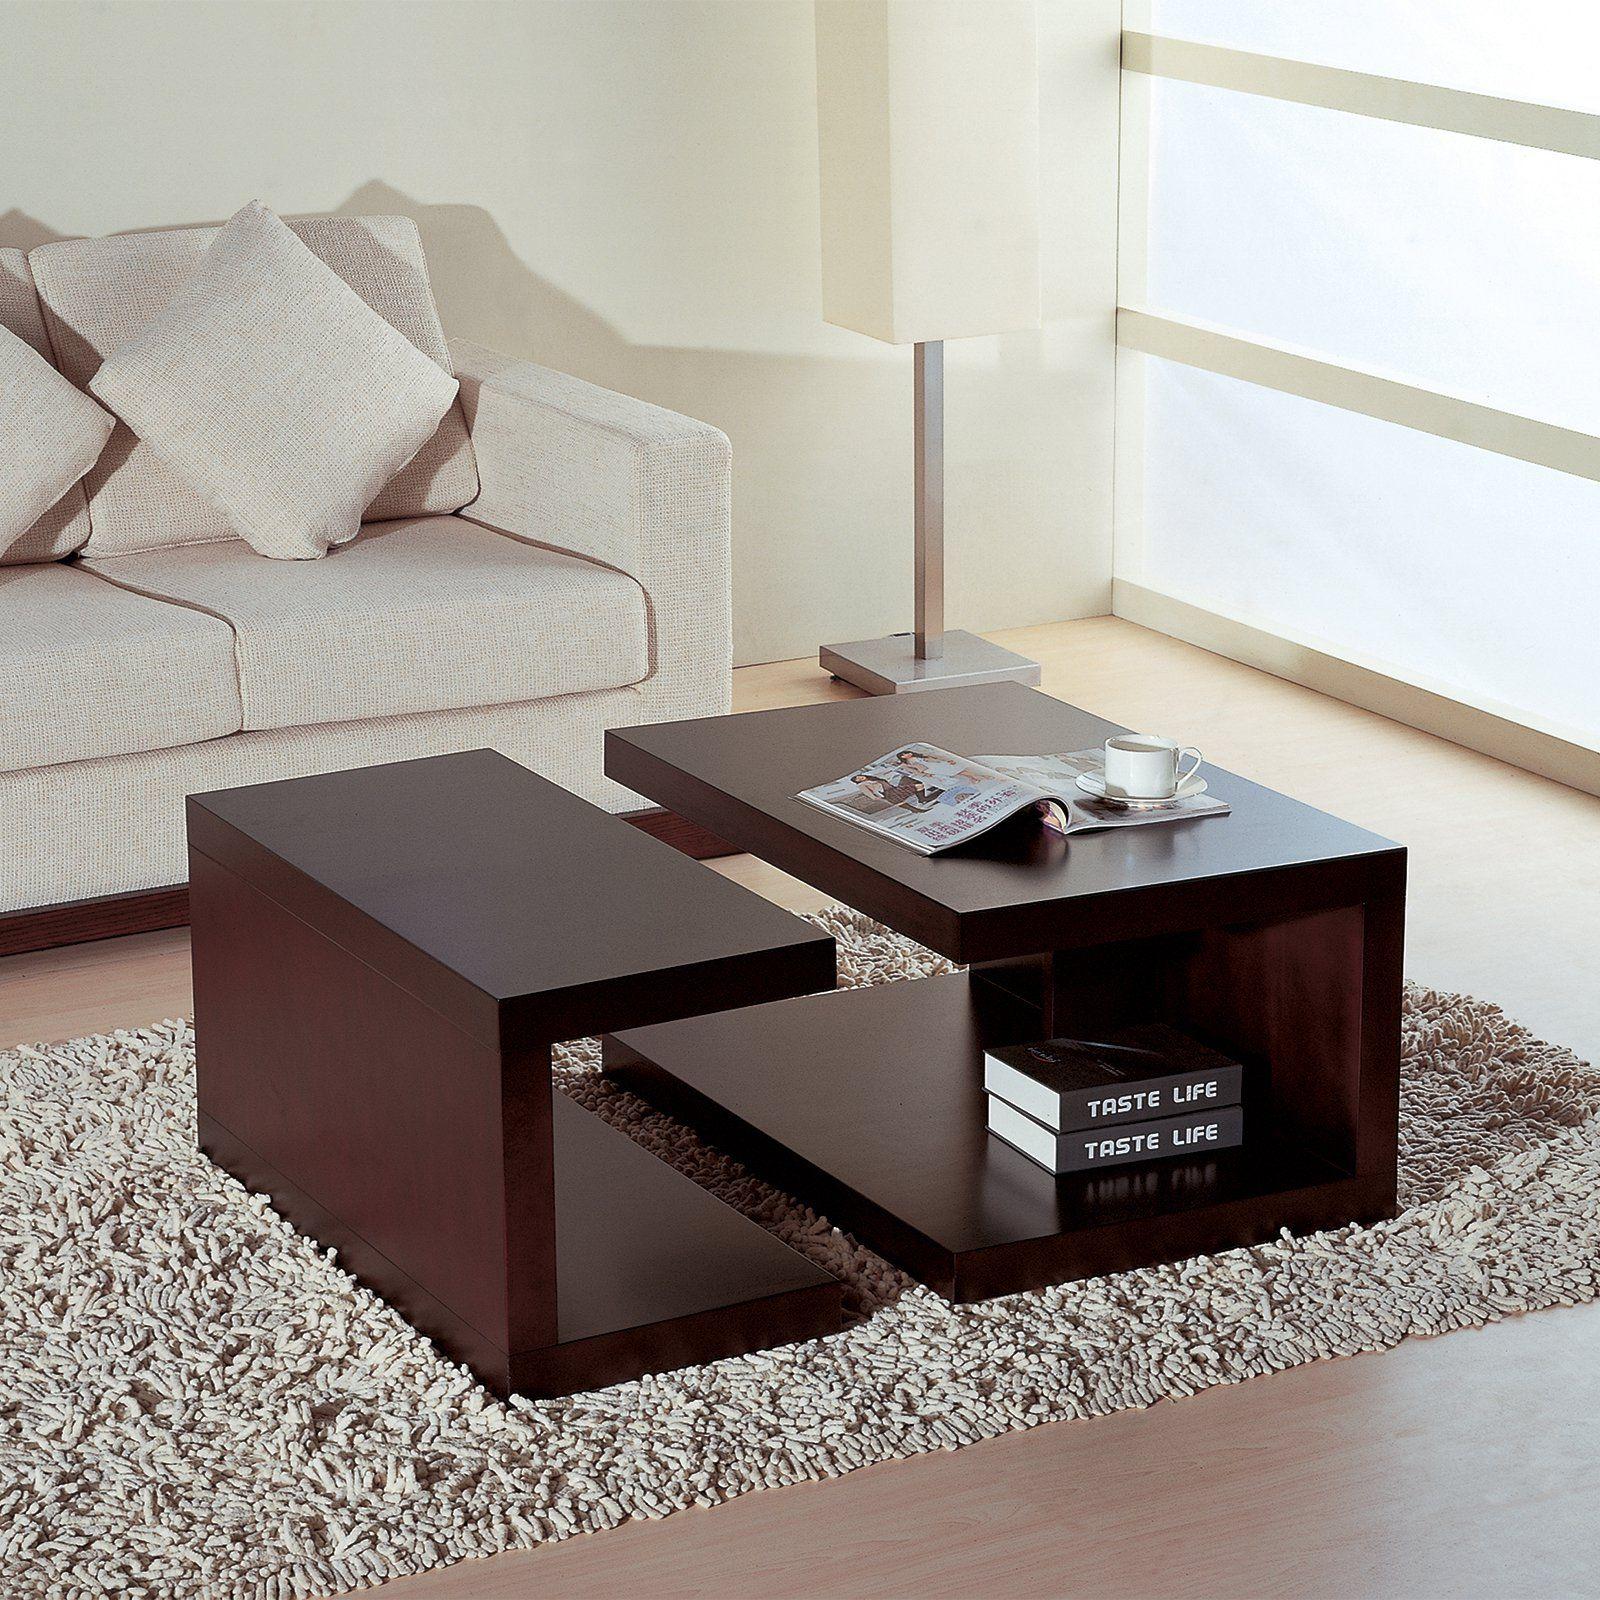 Jengo 2 Piece Coffee Table Espresso Tables At